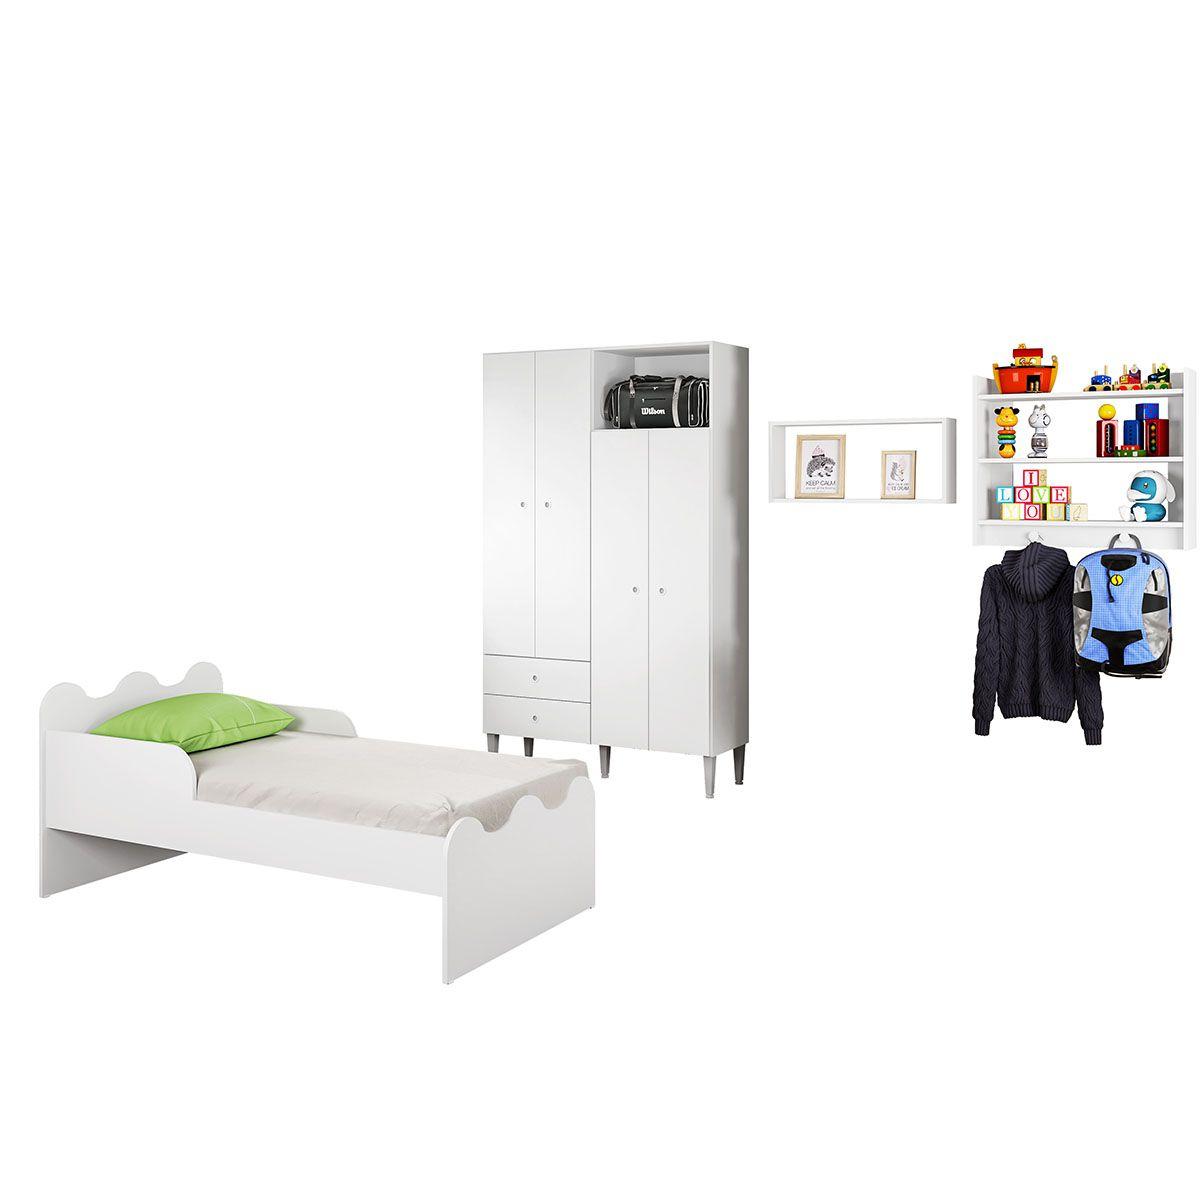 Quarto Infantil Completo Mini Cama Guarda Roupa 4 Portas Estante 3 Prateleiras Nicho Grande Gostosura Branco - Art In Móveis